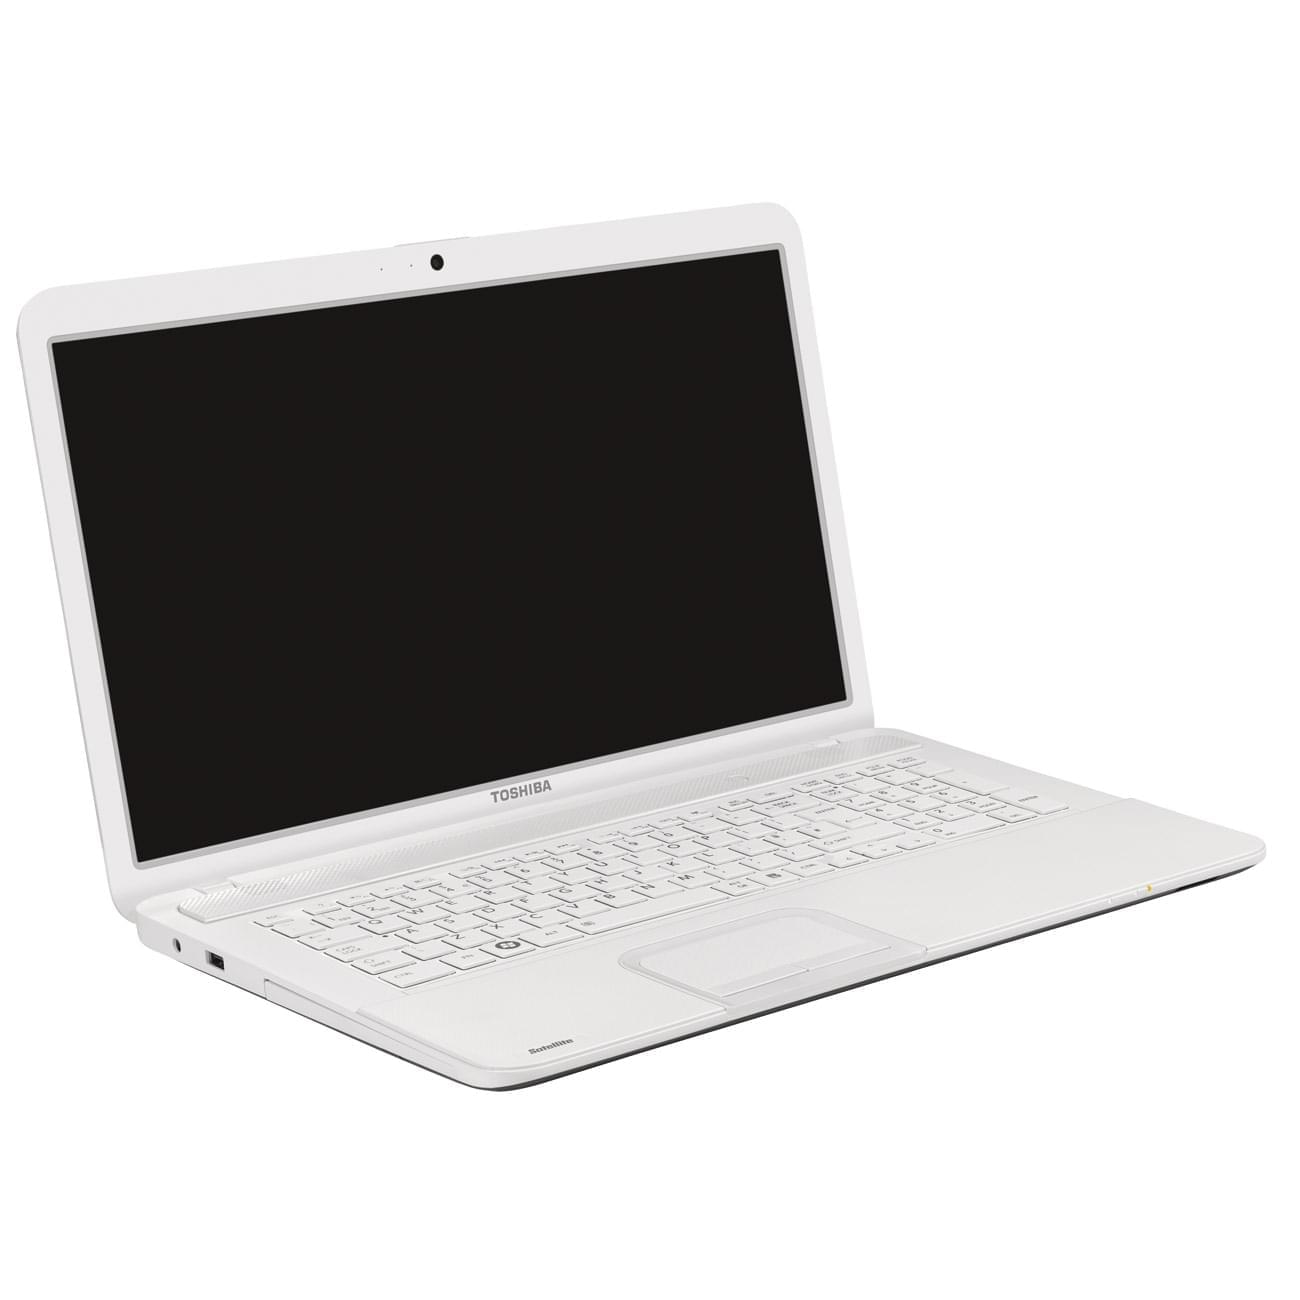 Toshiba C875-13E (PSCBAE-02L00EFR fini) - Achat / Vente PC Portable sur Cybertek.fr - 0